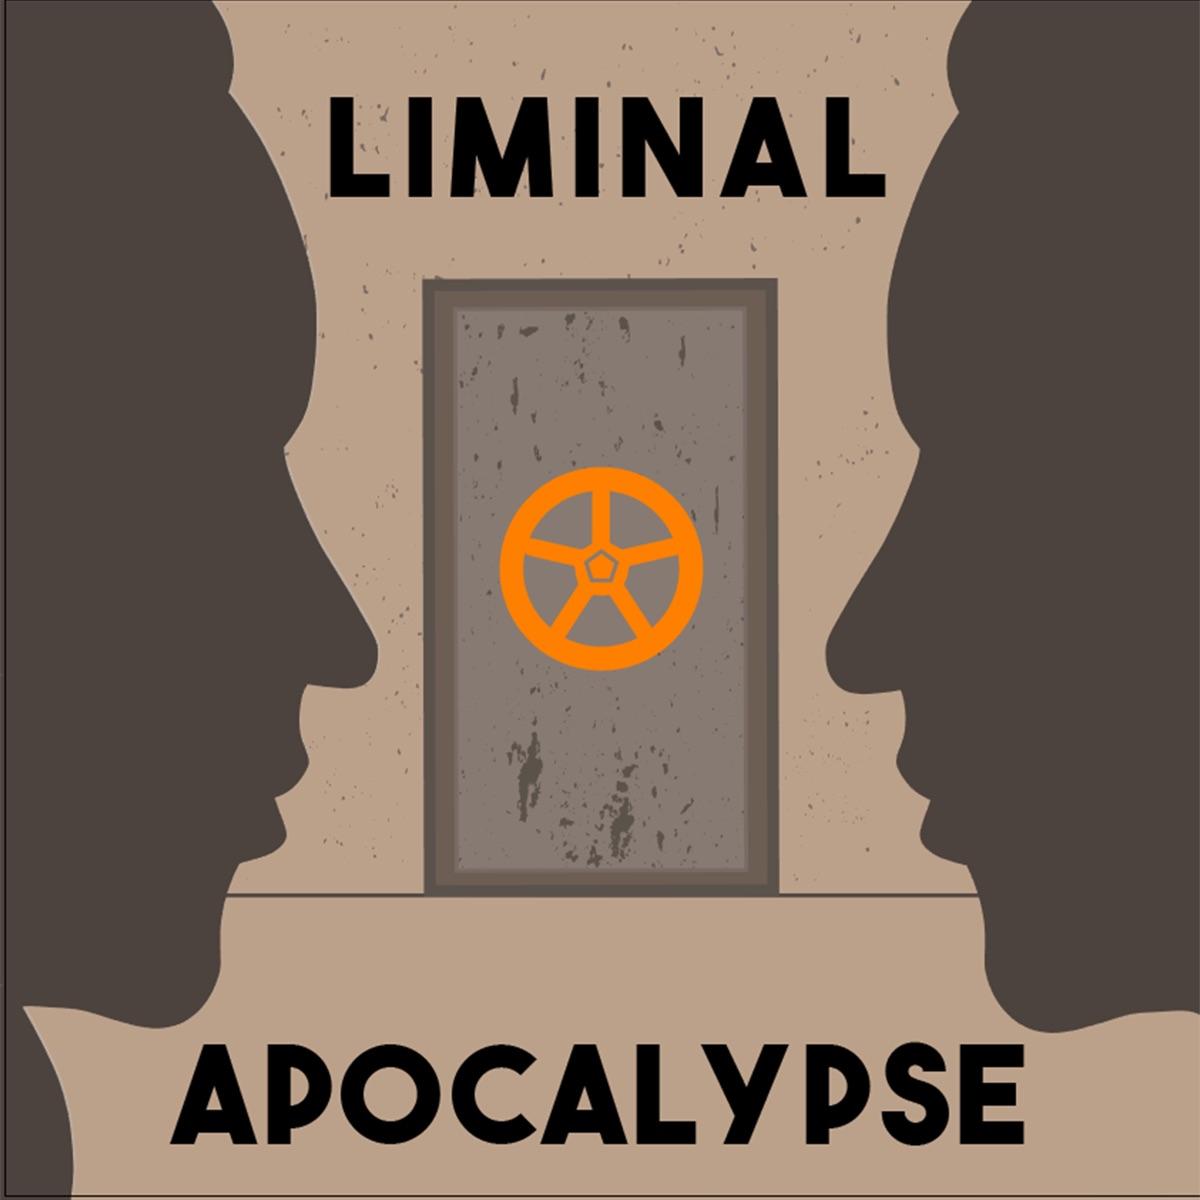 Liminal Apocalypse